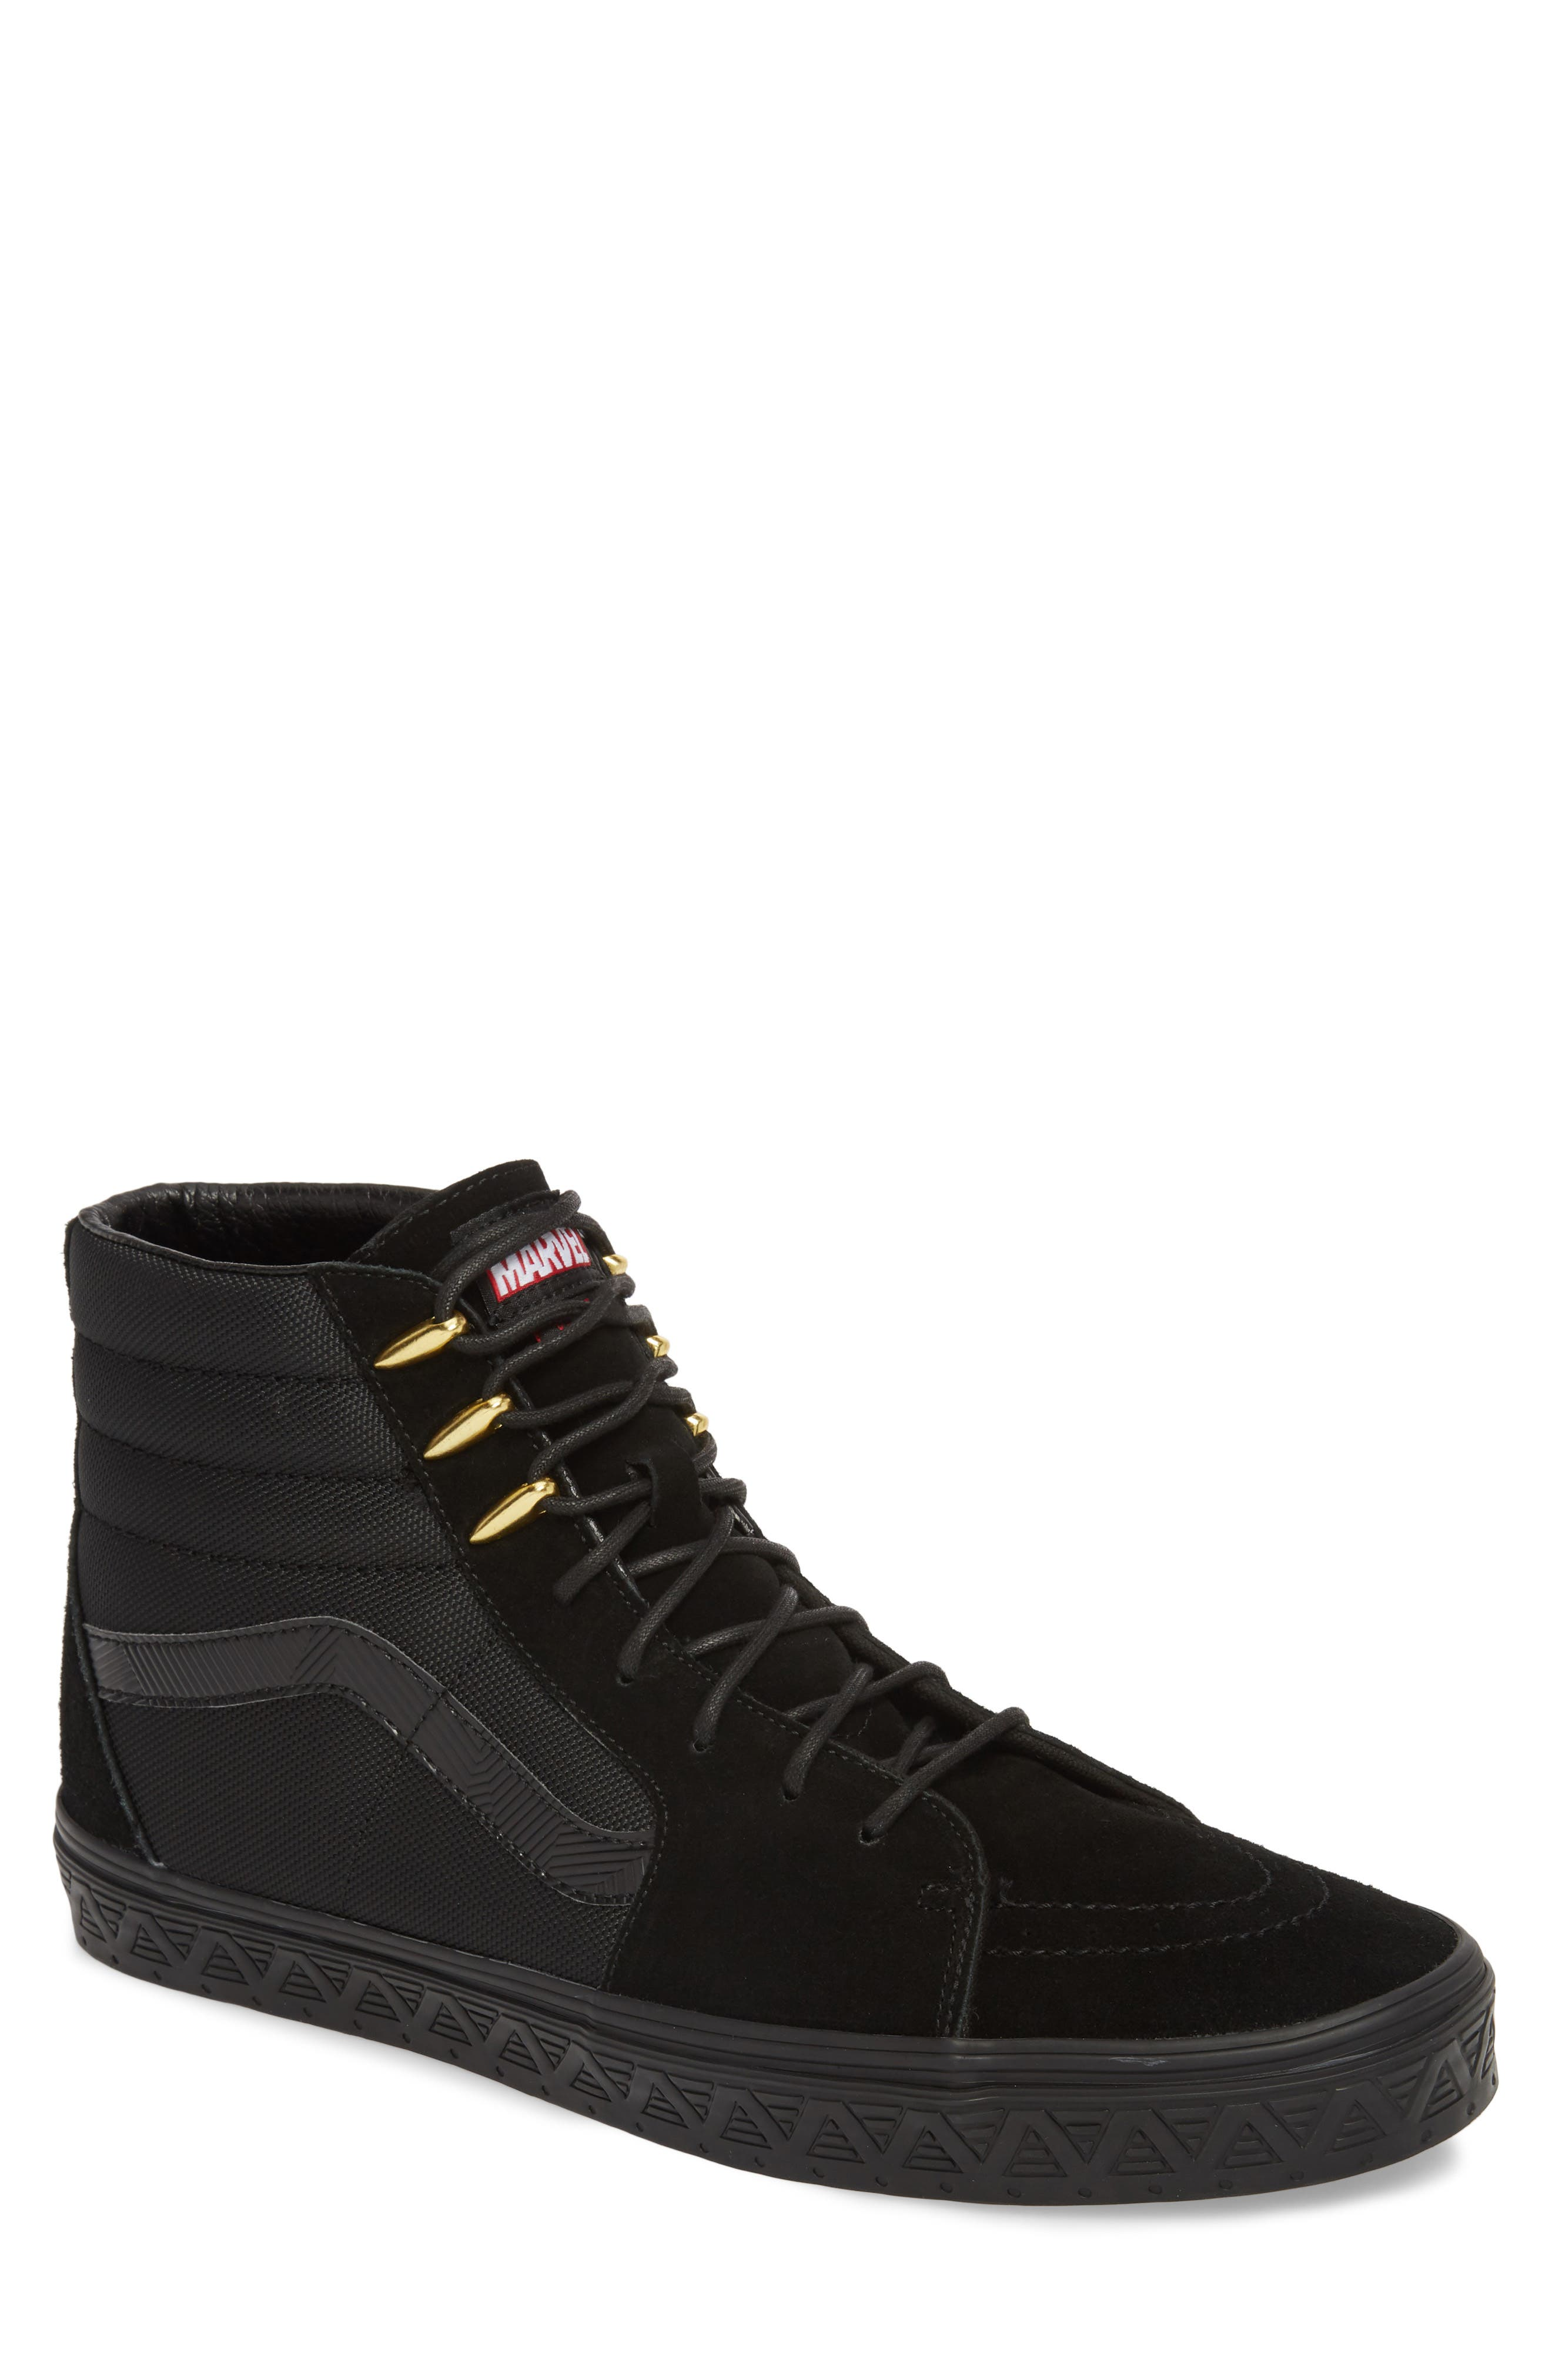 x Marvel<sup>®</sup> UA Sk8-Hi Sneaker,                             Main thumbnail 1, color,                             001